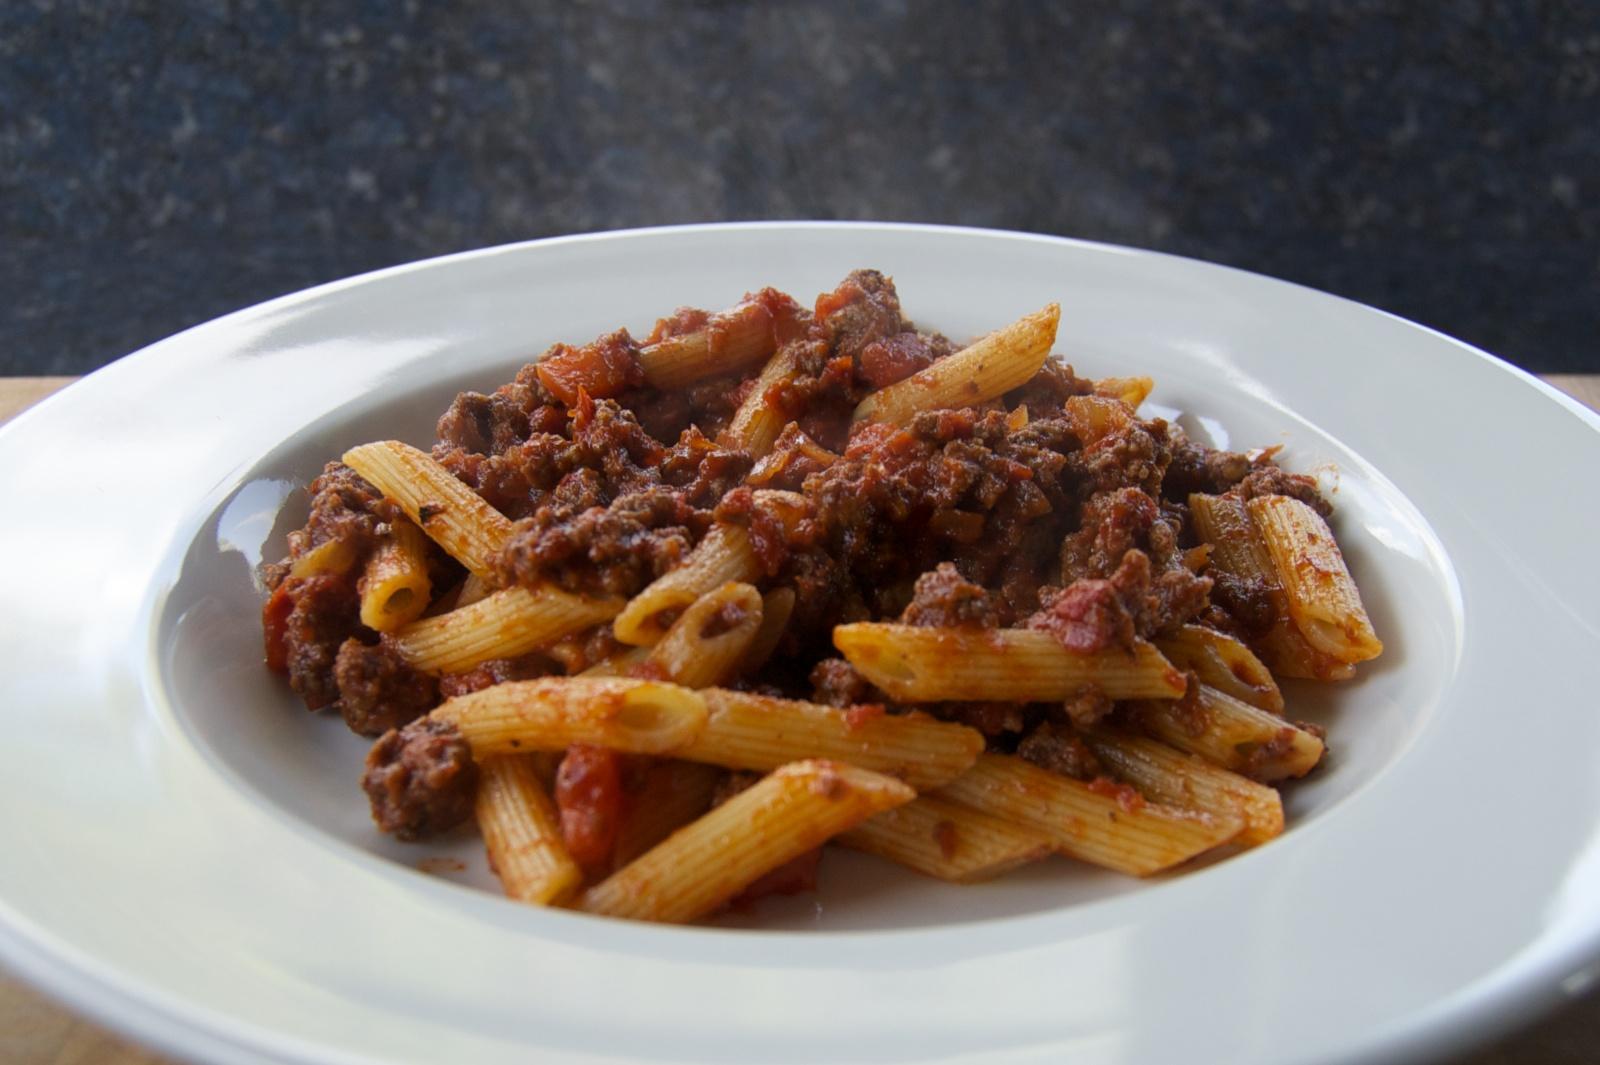 http://blog.rickk.com/food/2013/05/21/ate.2013.05.21.d.jpg